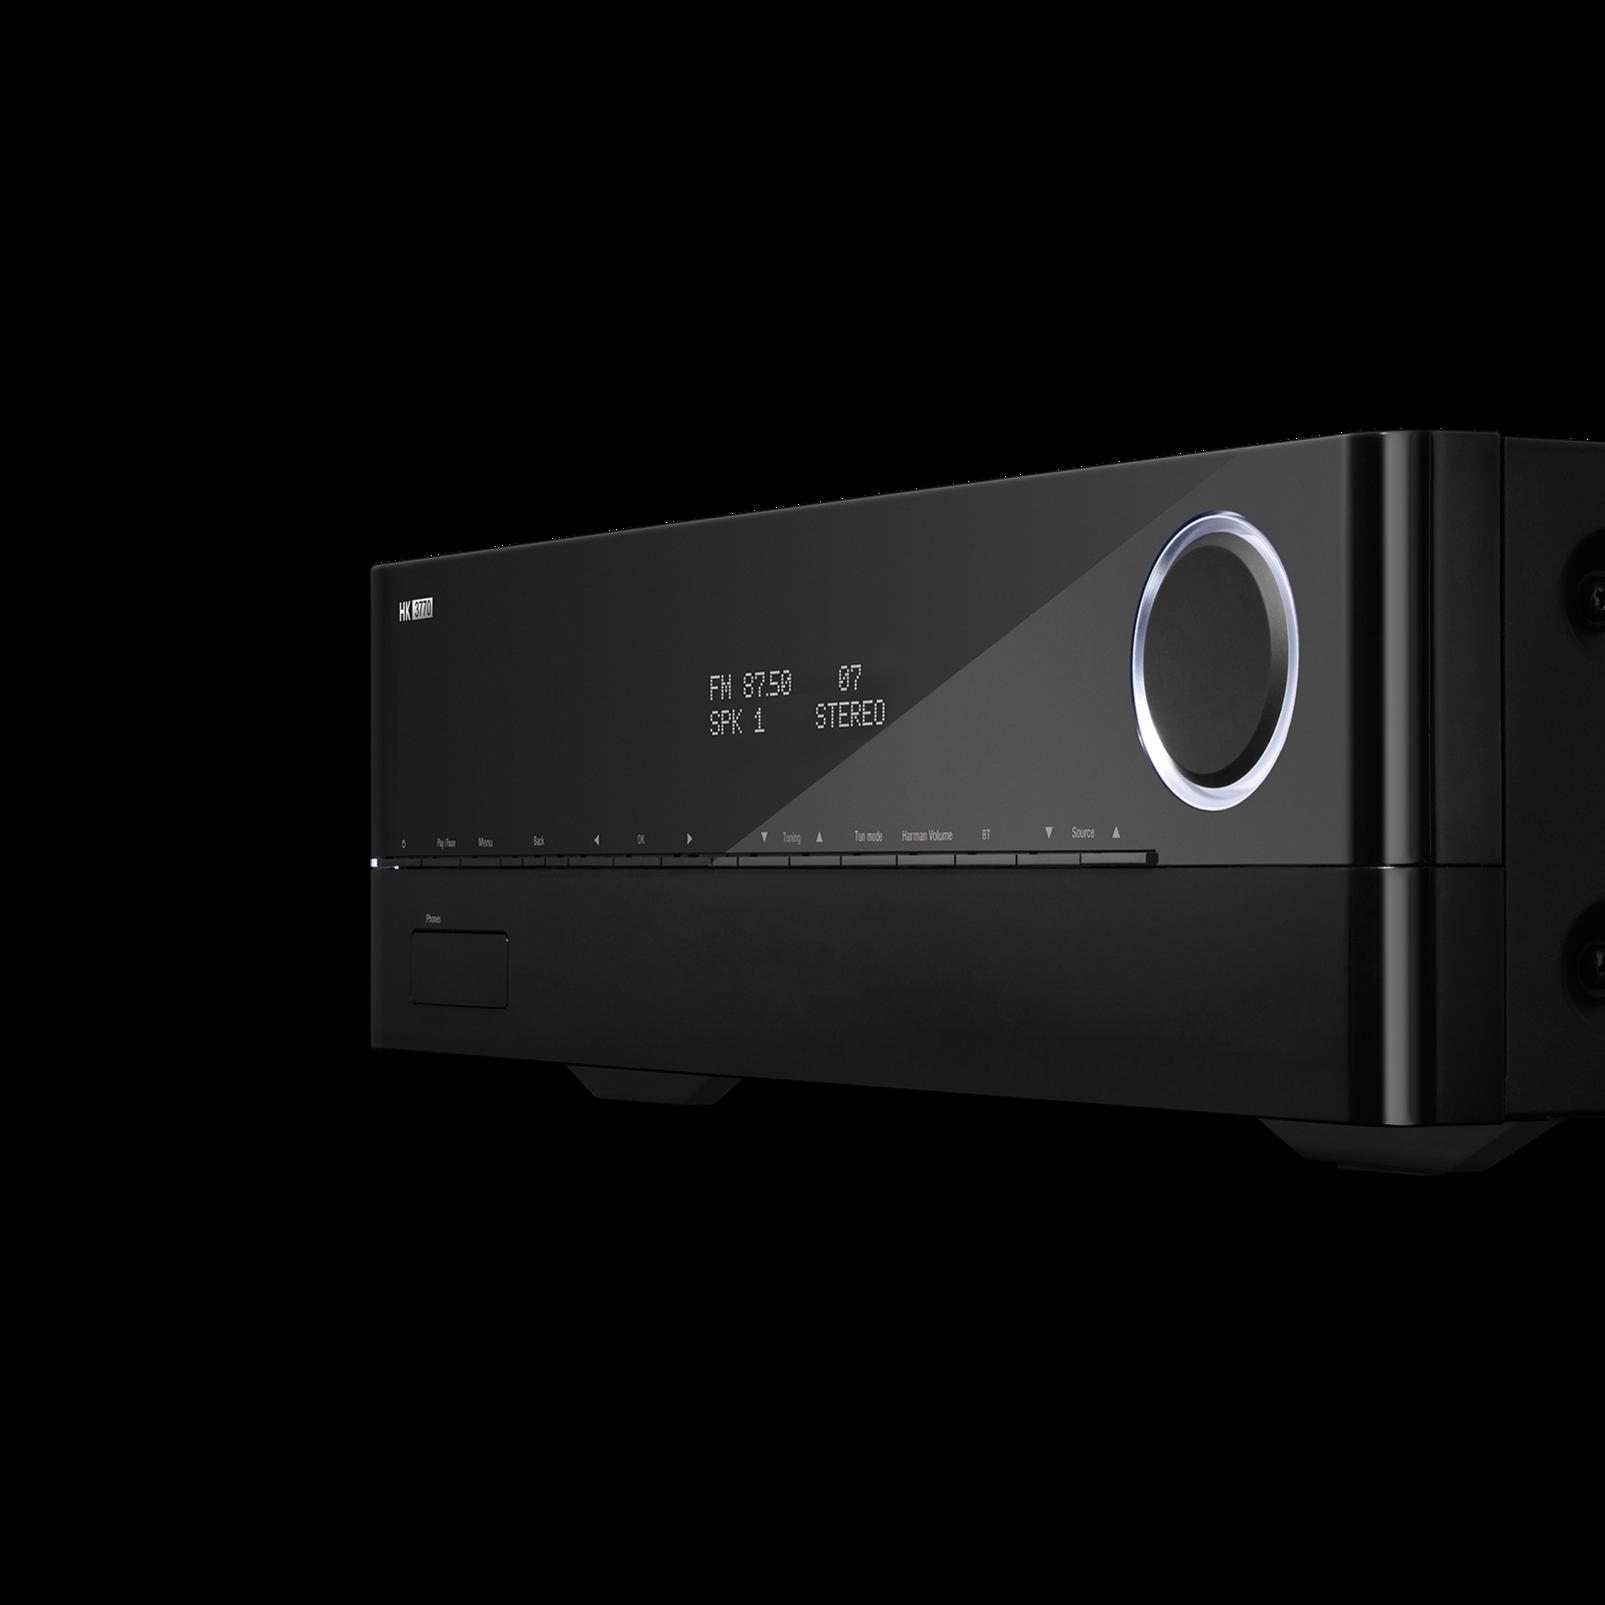 HK 3770 - Black - 240 watt stereo receiver with network connectivity - Detailshot 1